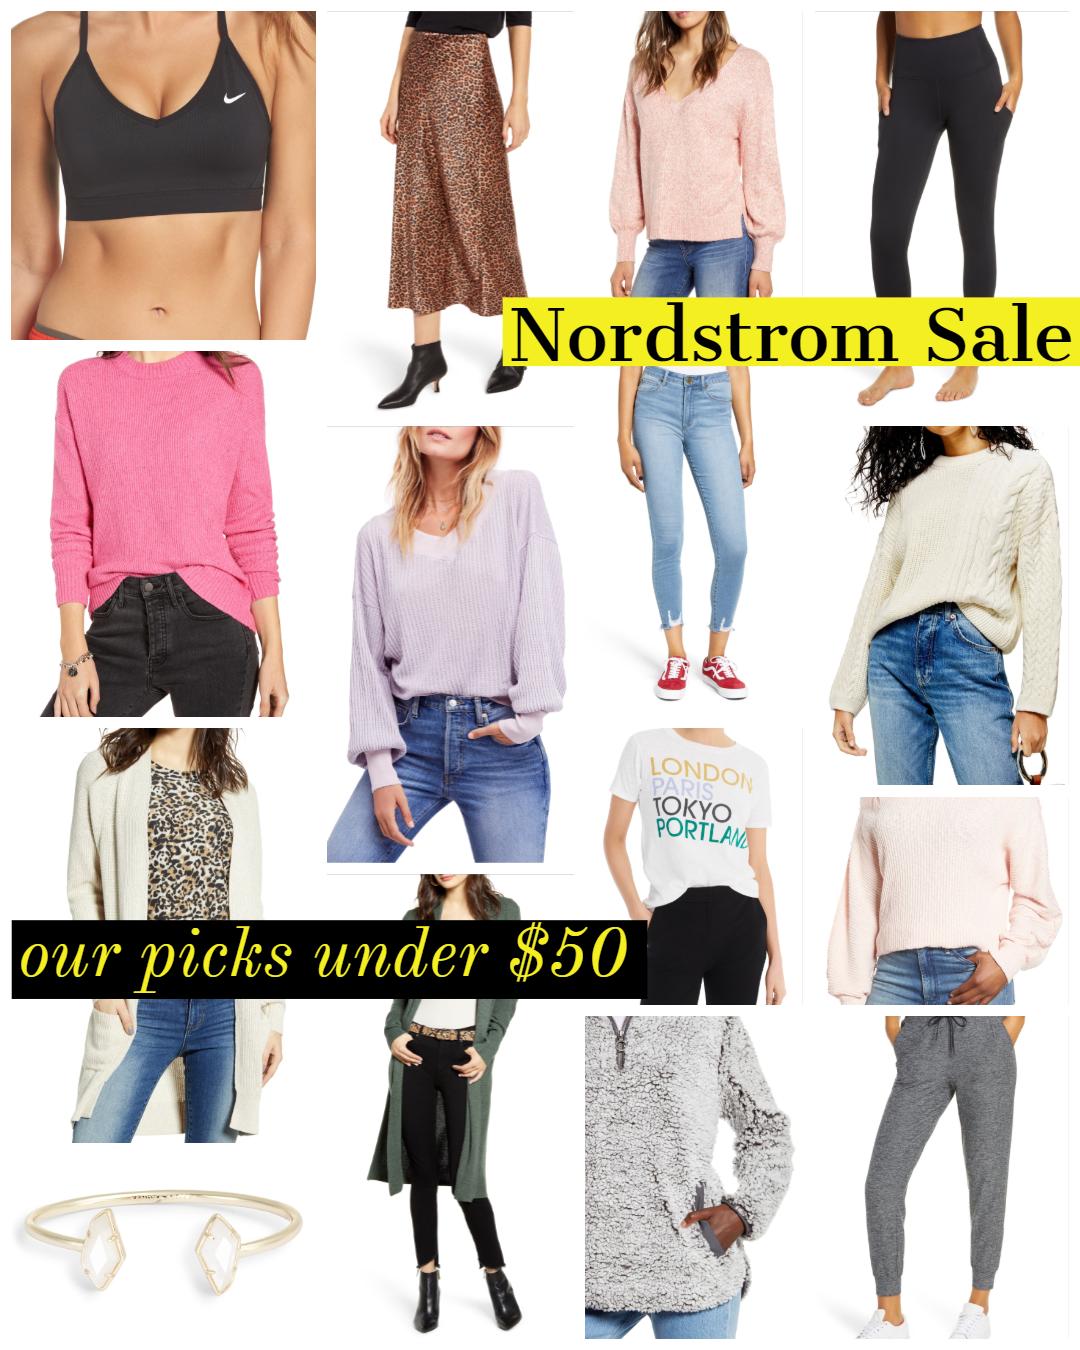 nordstrom sale under $50